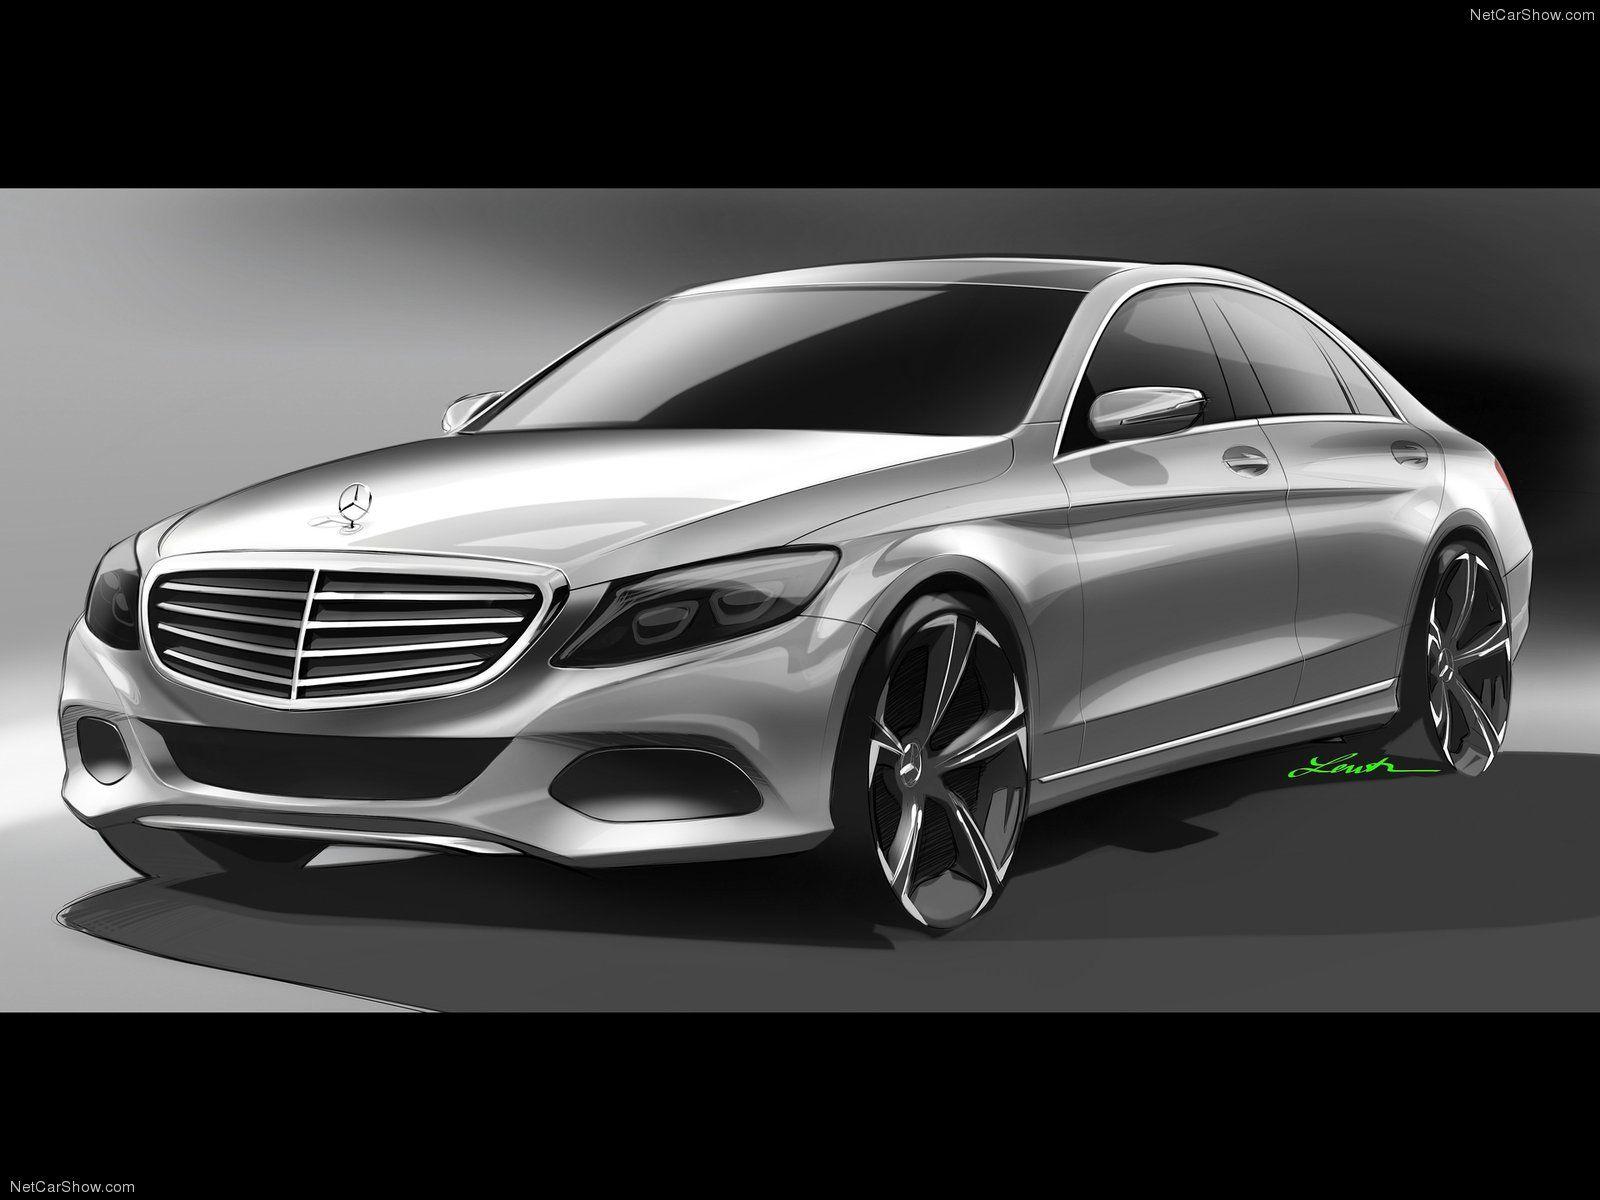 mercedes benz c class design sketch